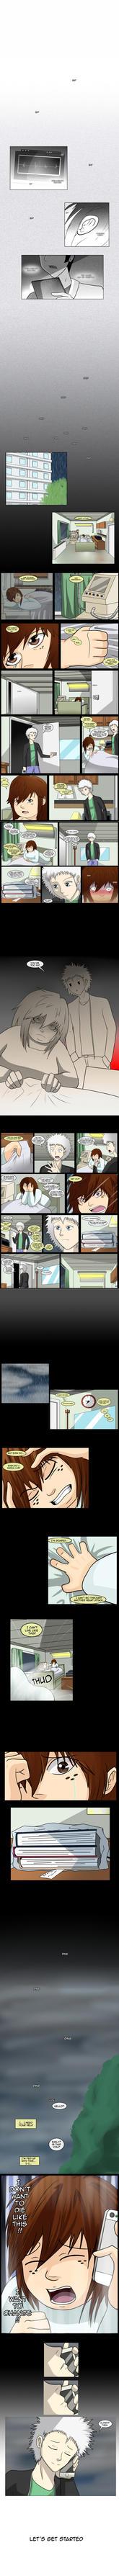 I Care - Part 2  (Webtoon Challenge) by Edowaado